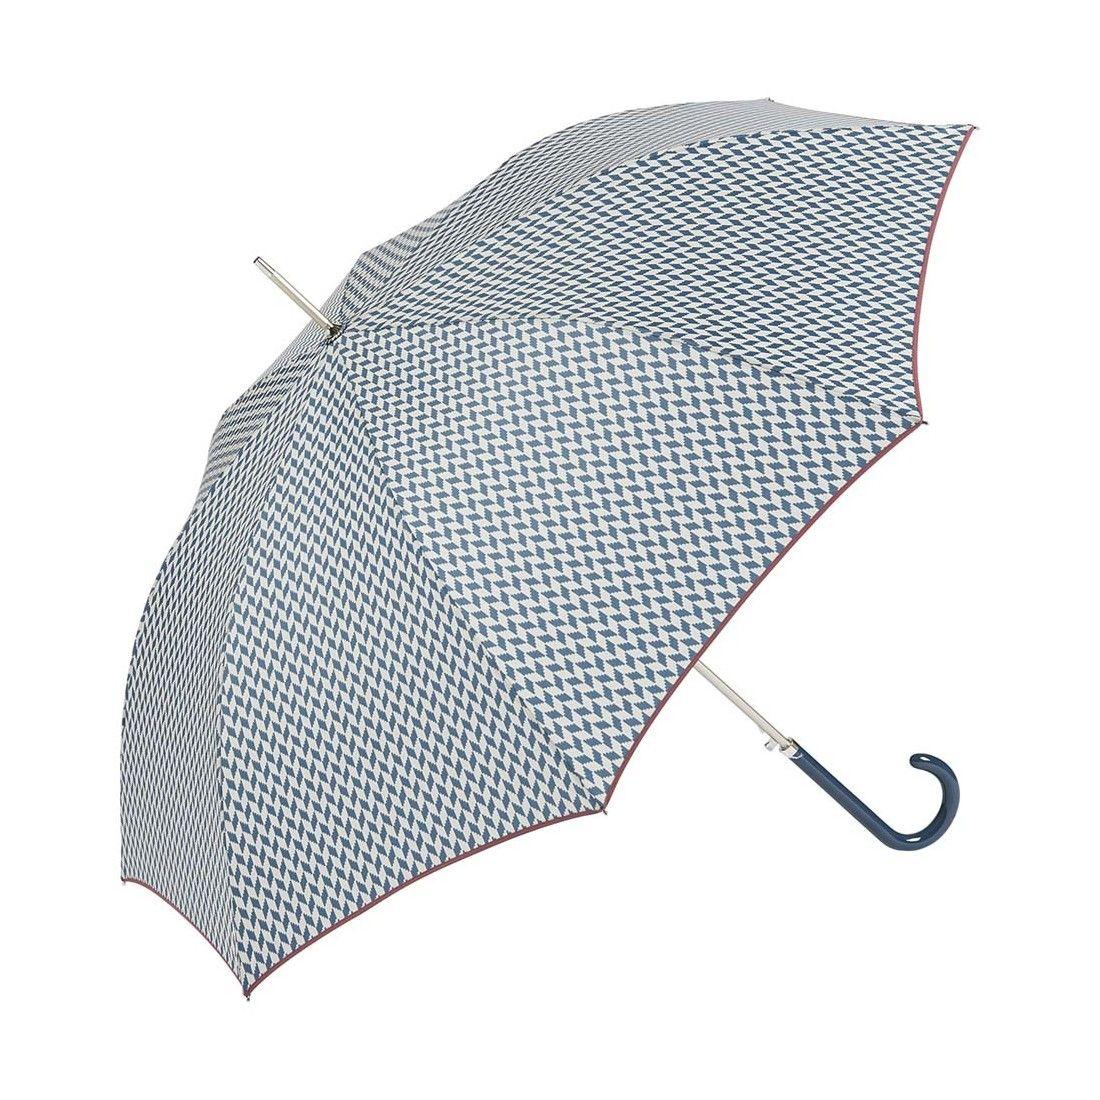 Paraguas 10711 Ezpeleta